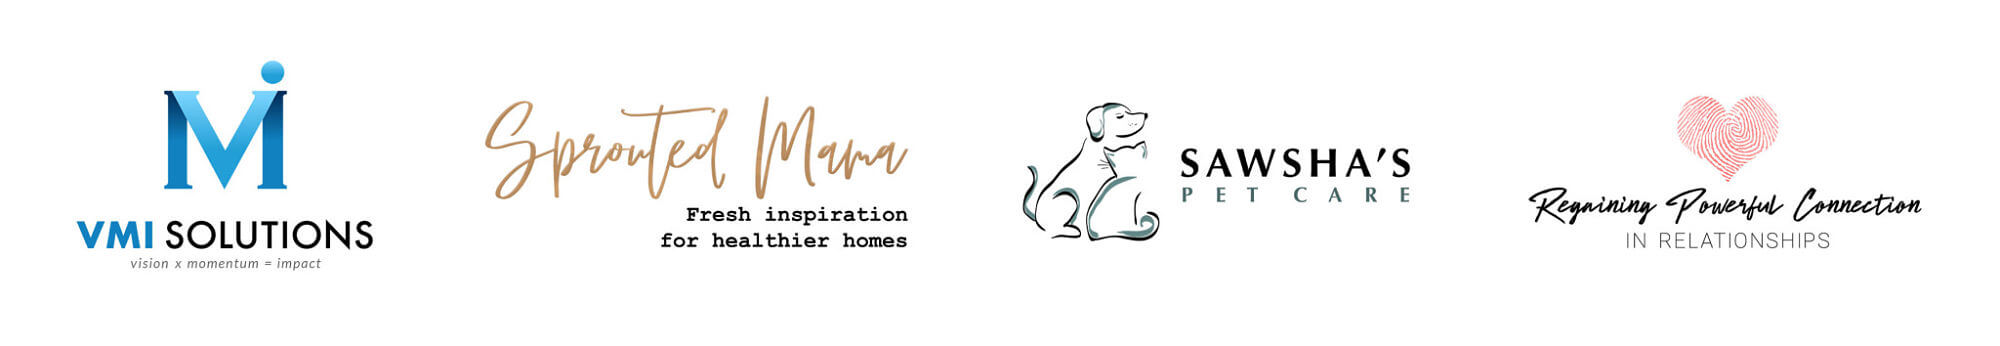 Sample Logos Designed by Kayli